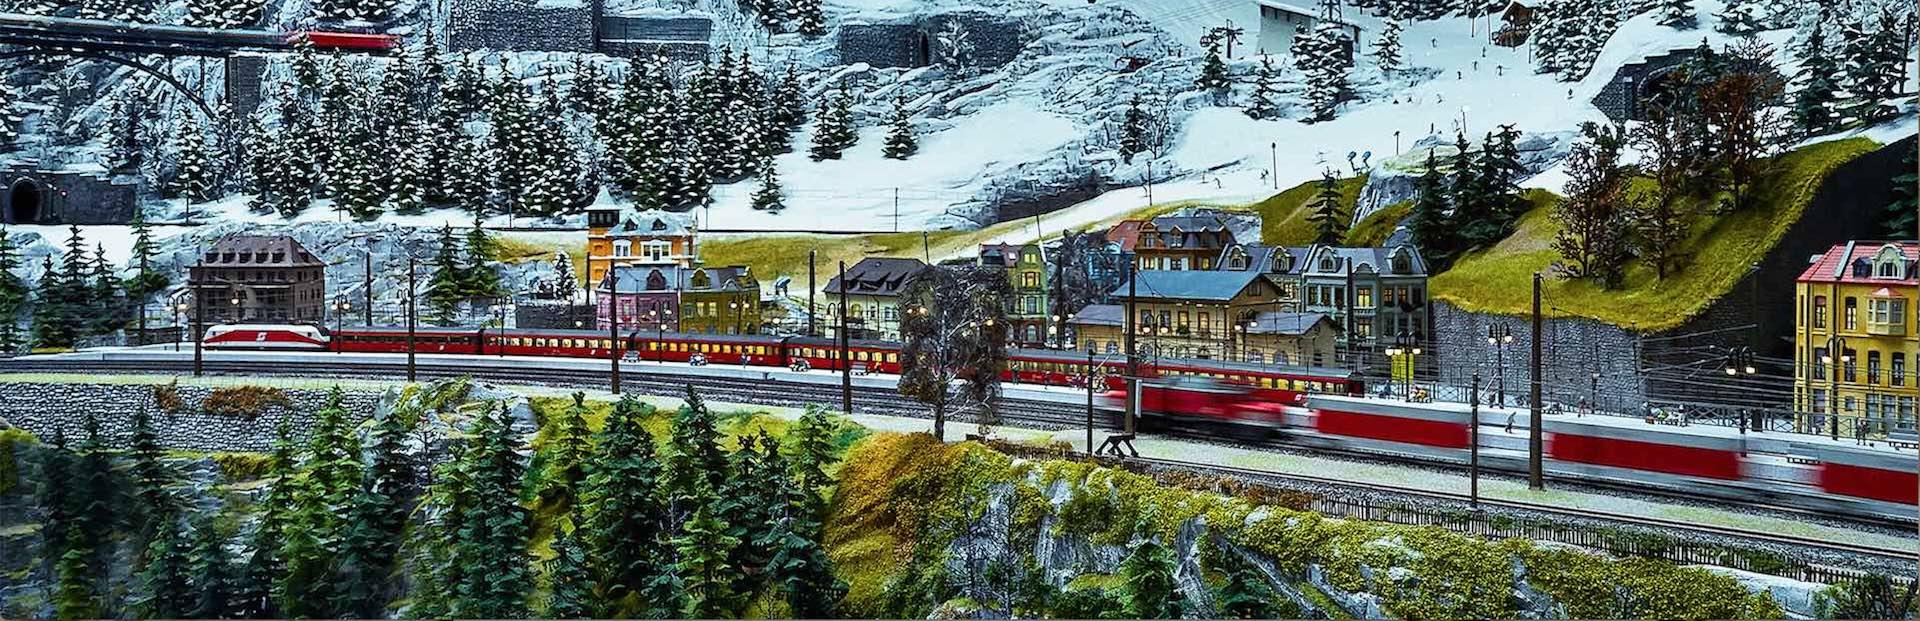 Details in the Model Railway